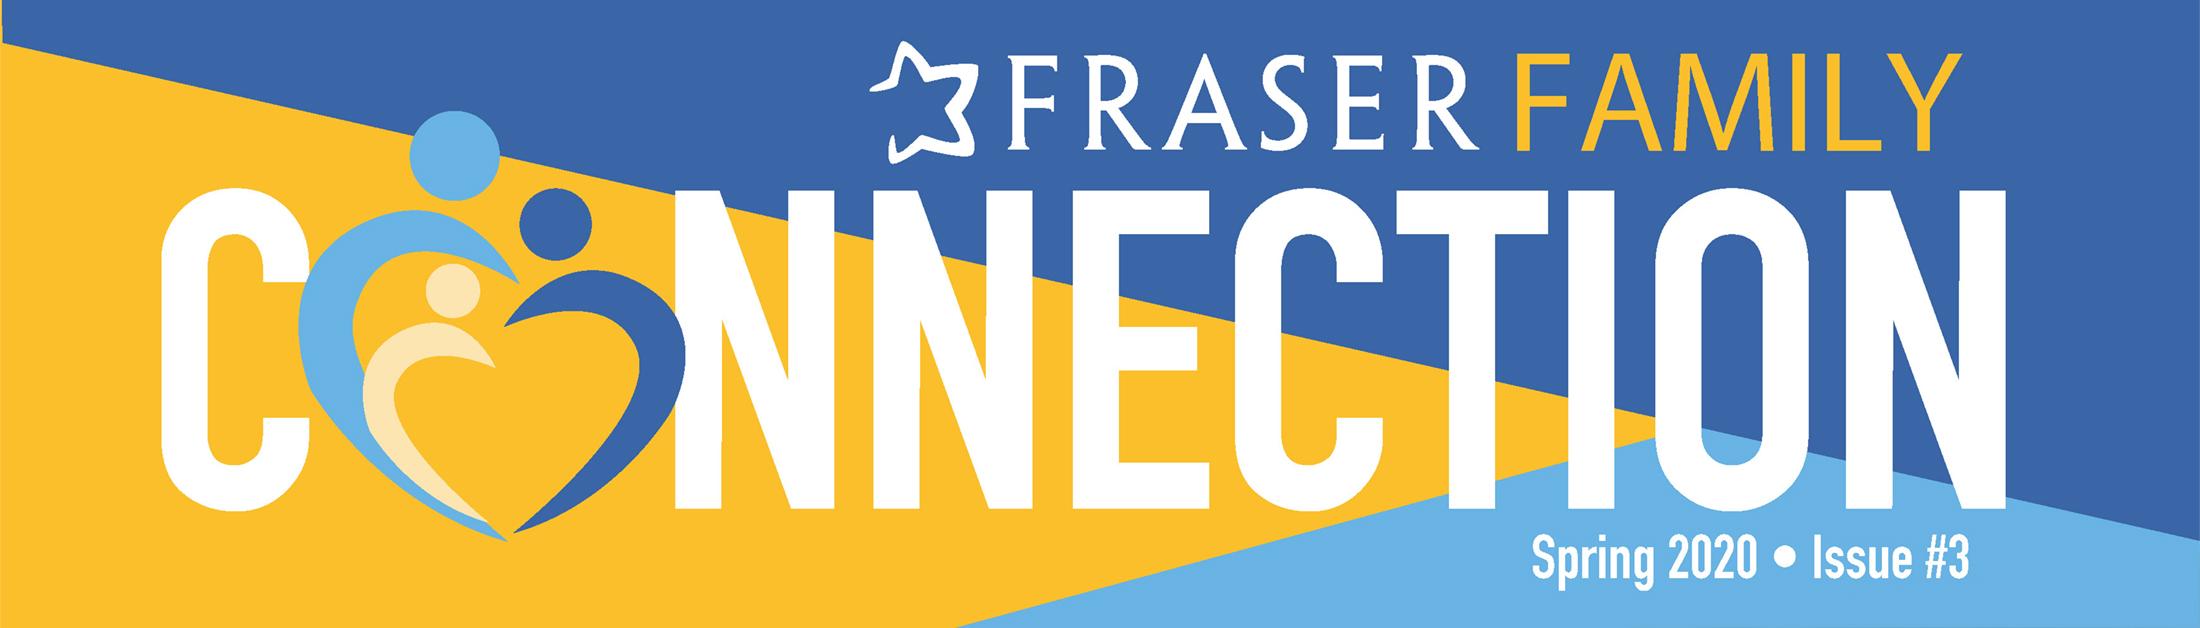 Fraser Family Connection - Spring 2020